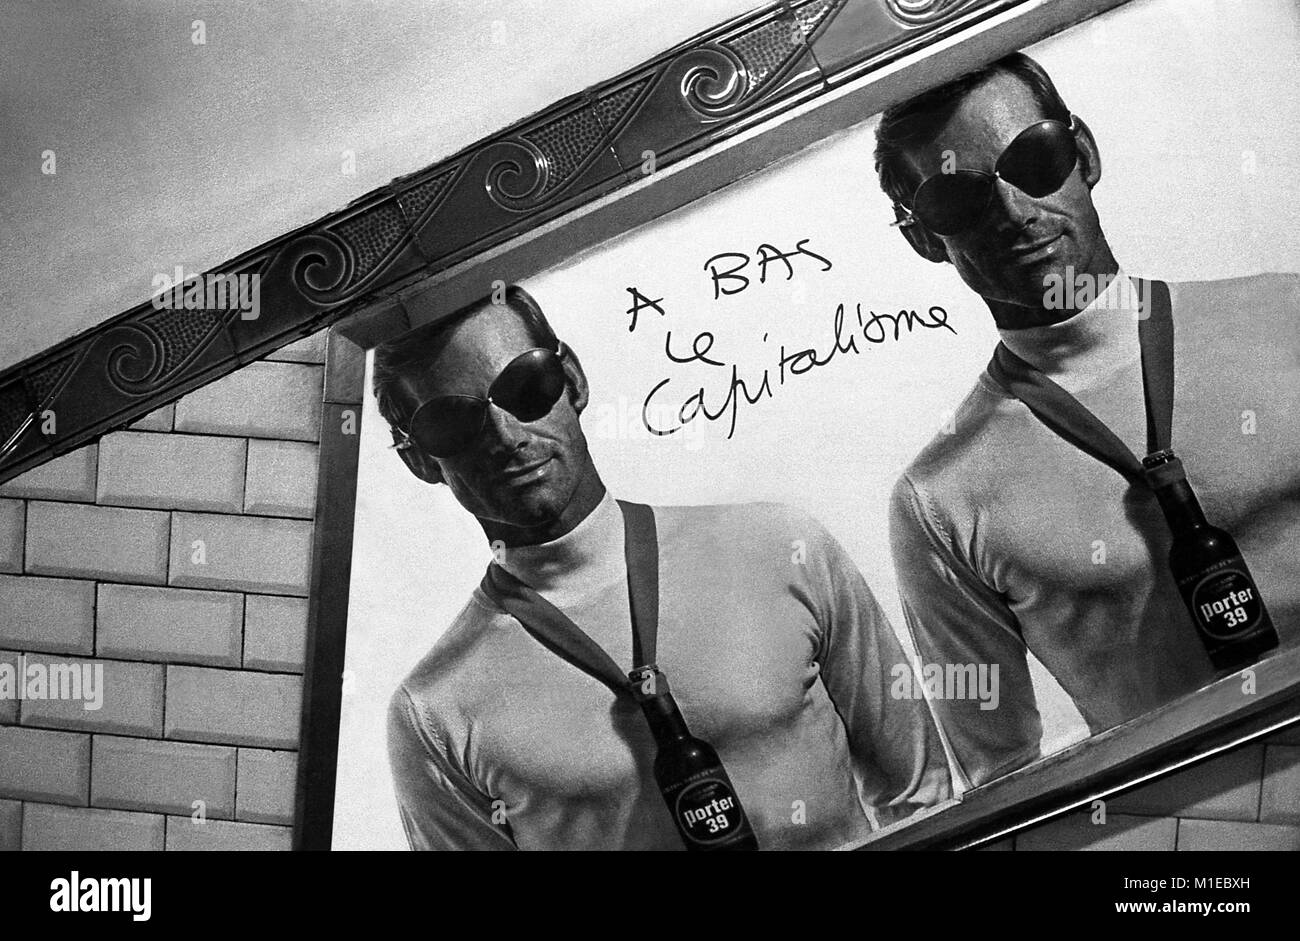 Philippe Gras / Le Pictorium -  Events of may 1968 in FRANCE. -  1968  -  France / Ile-de-France (region) / Paris Stock Photo